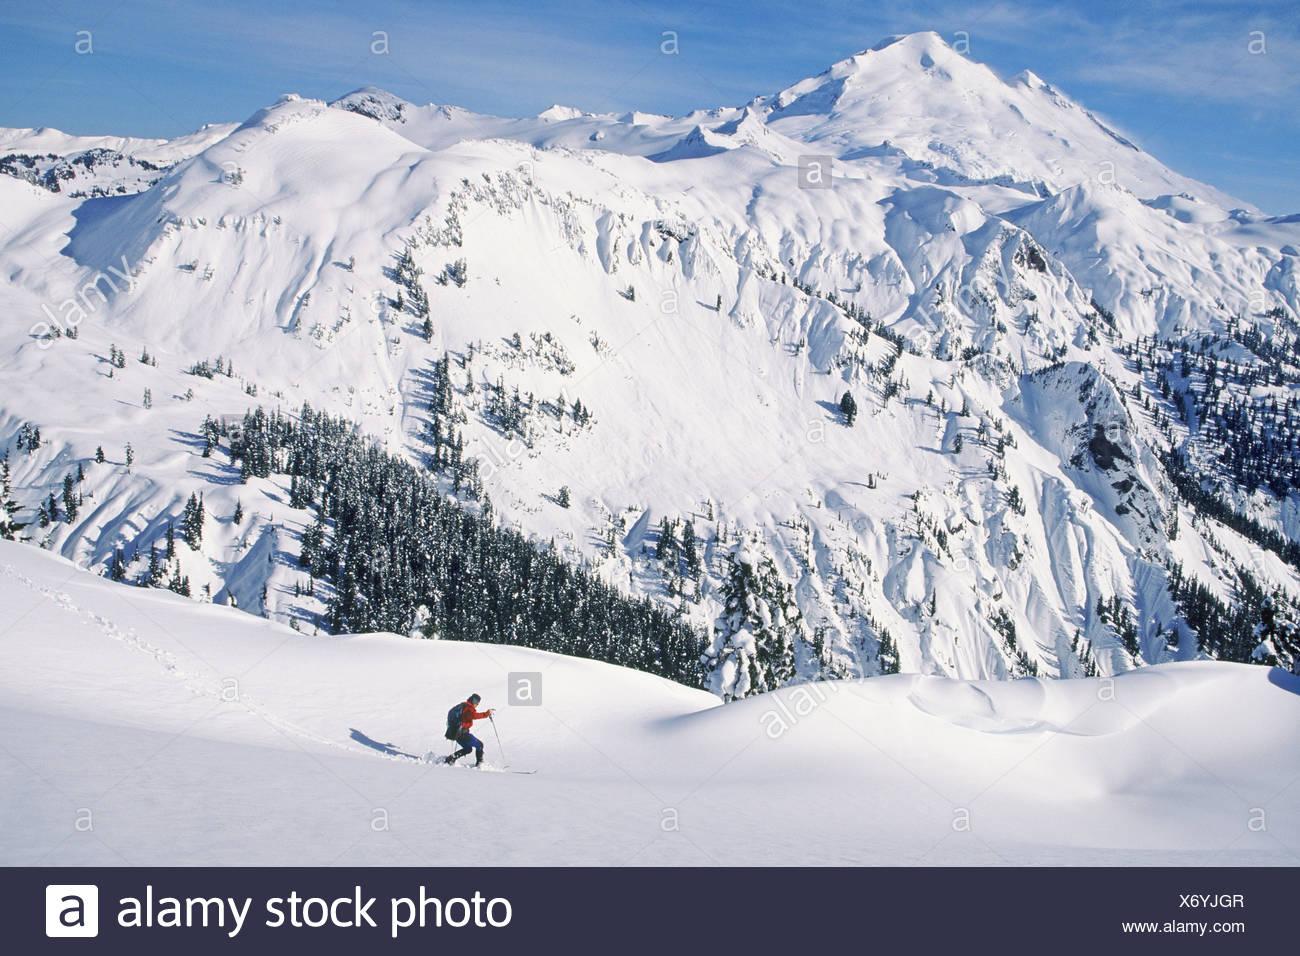 Man ski touring at artist's point - Stock Image